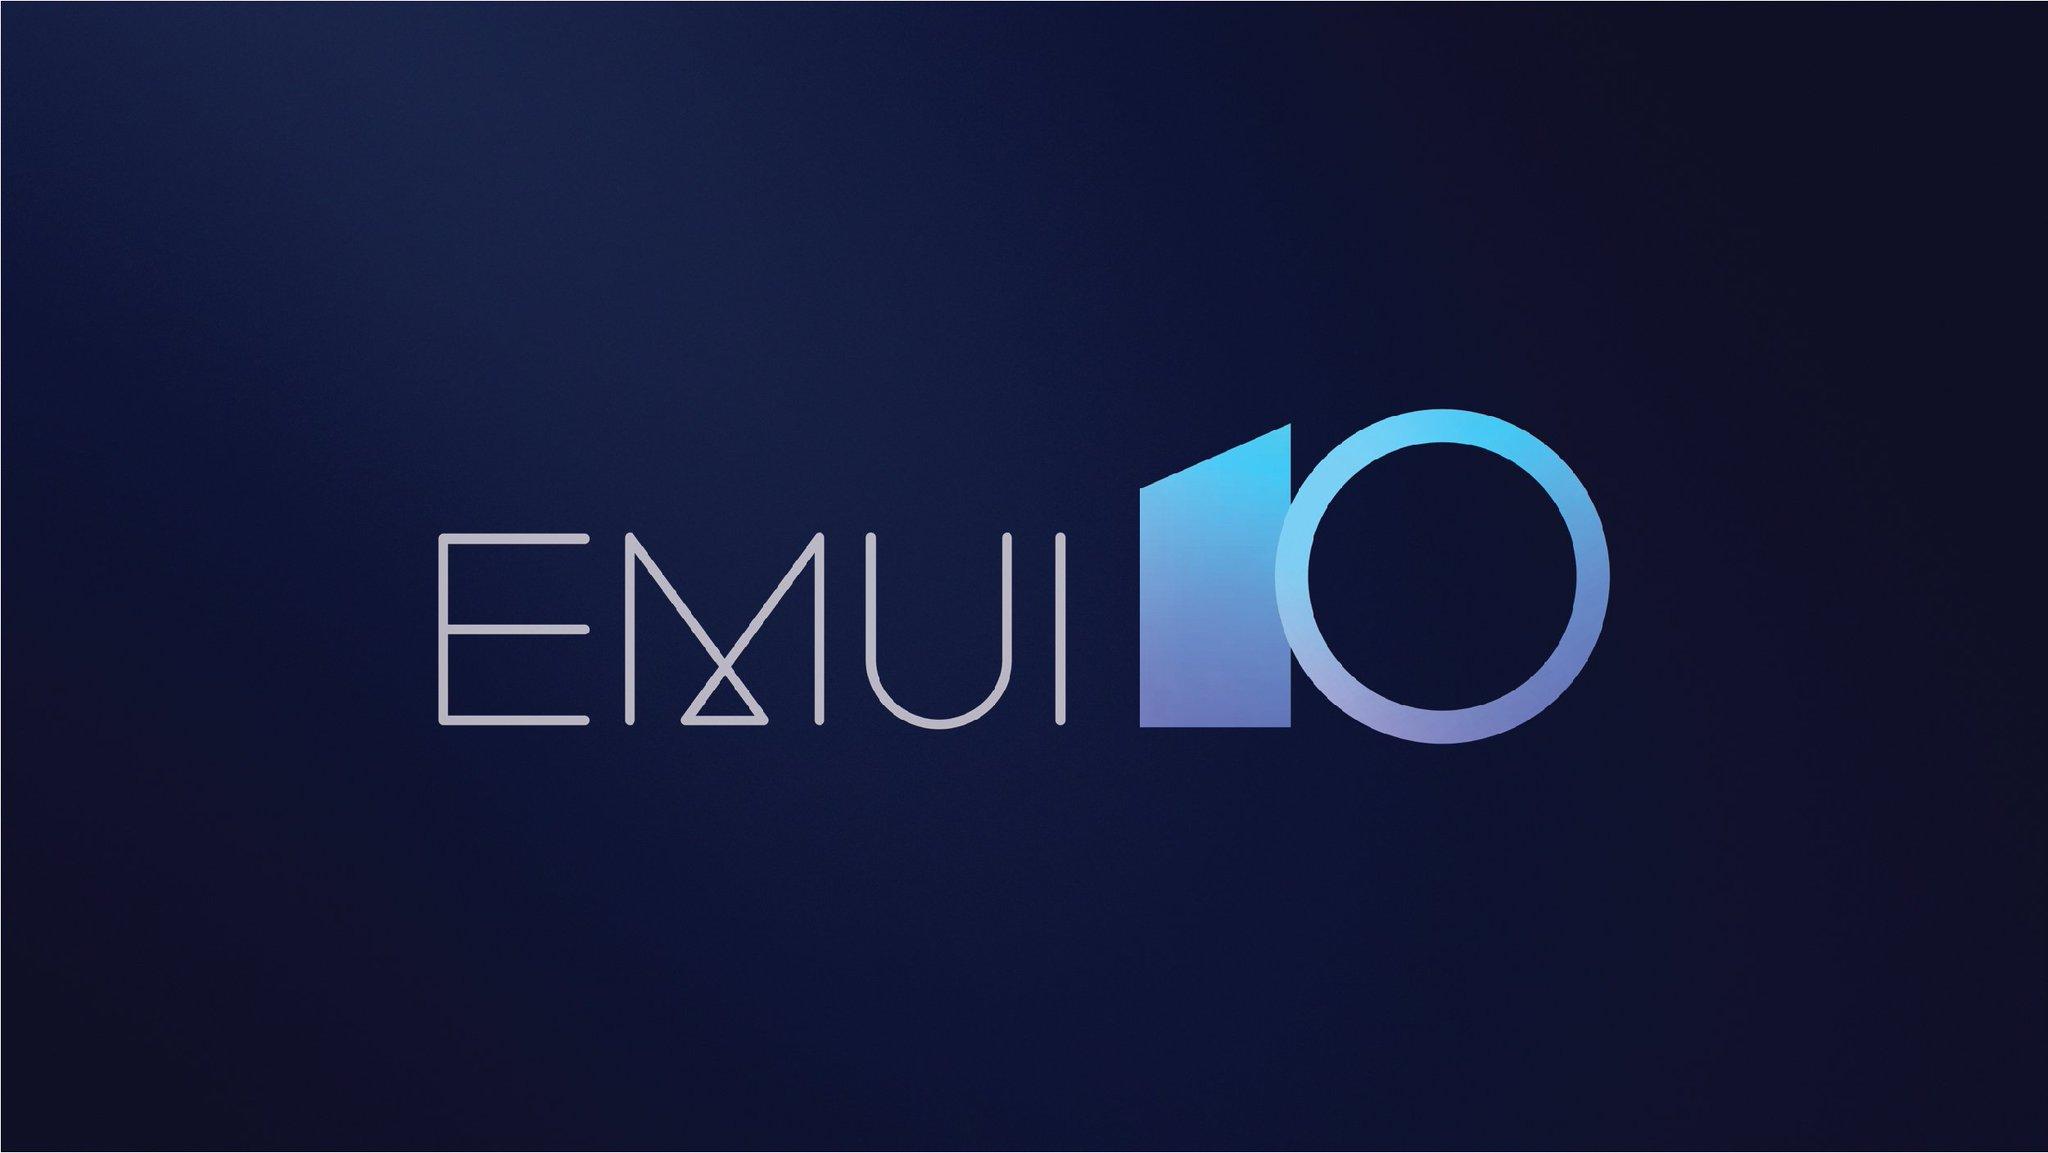 EMUI 10 beta aktualizacja Android 10 dla Huawei P20 Pro Mate 10 Pro Honor 8X